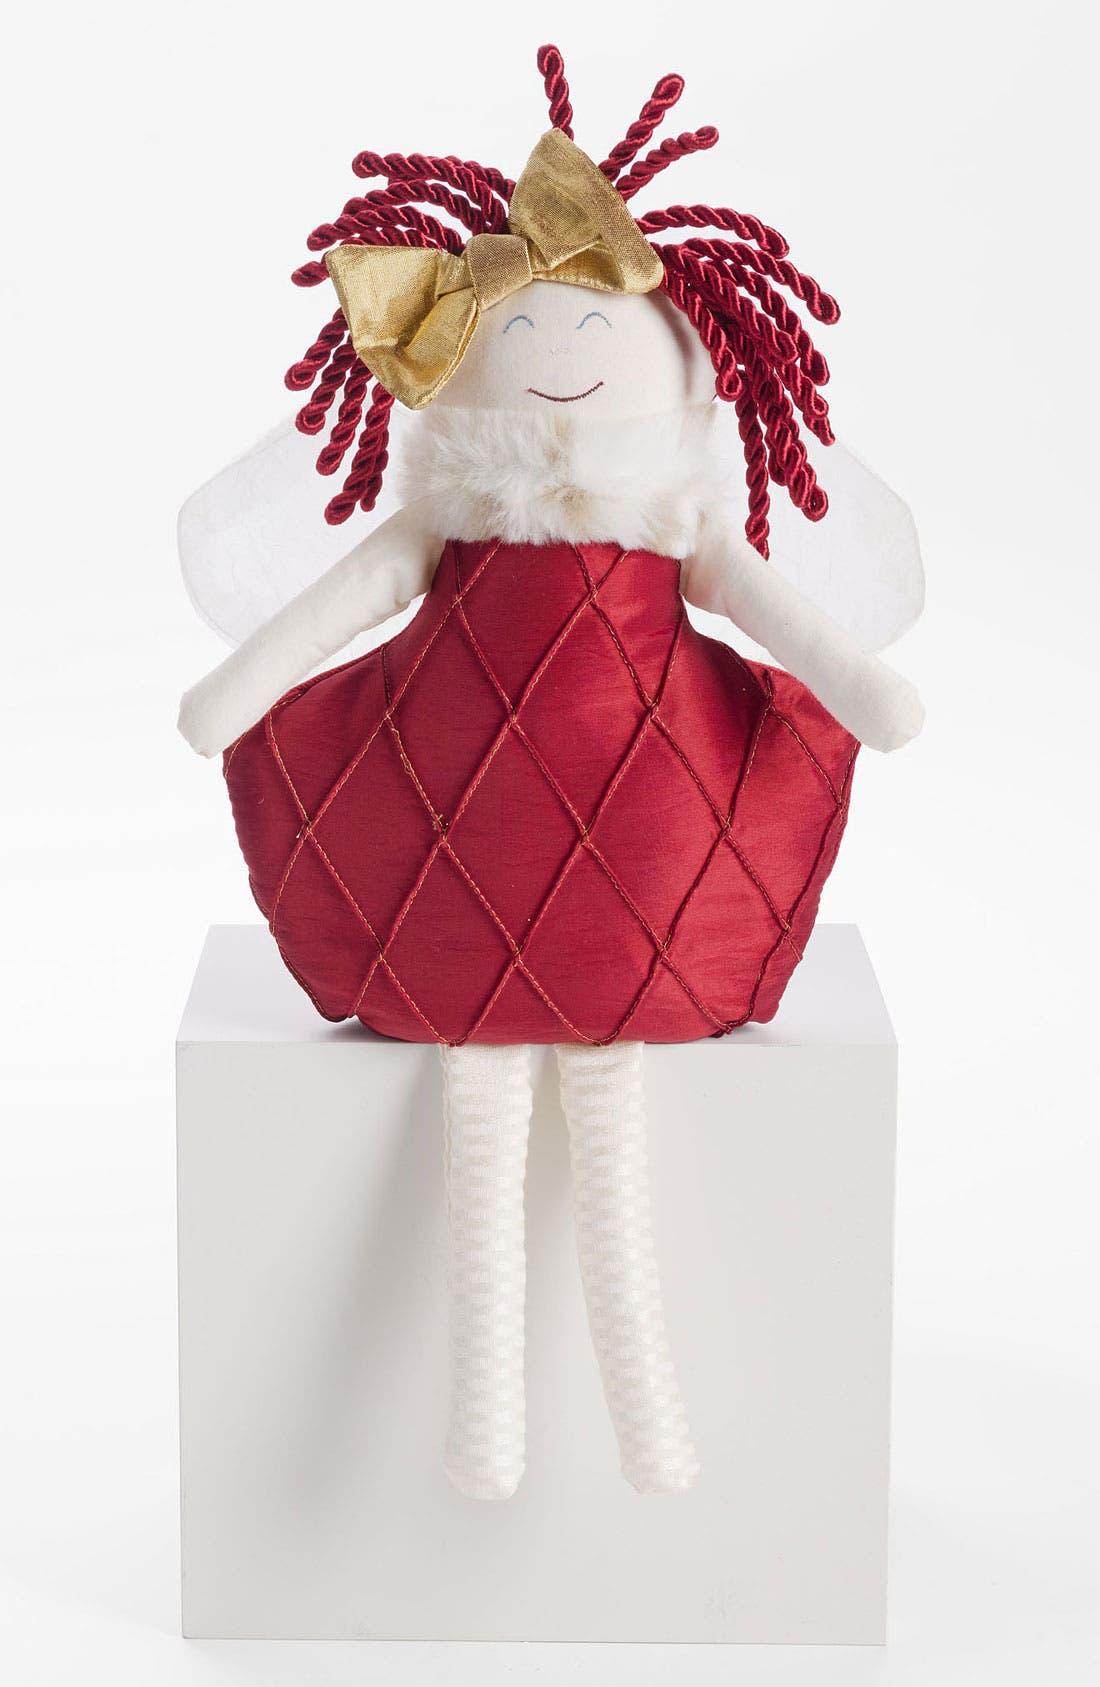 Main Image - Woof & Poof 'Small' Sugar Plum Fairy Decoration